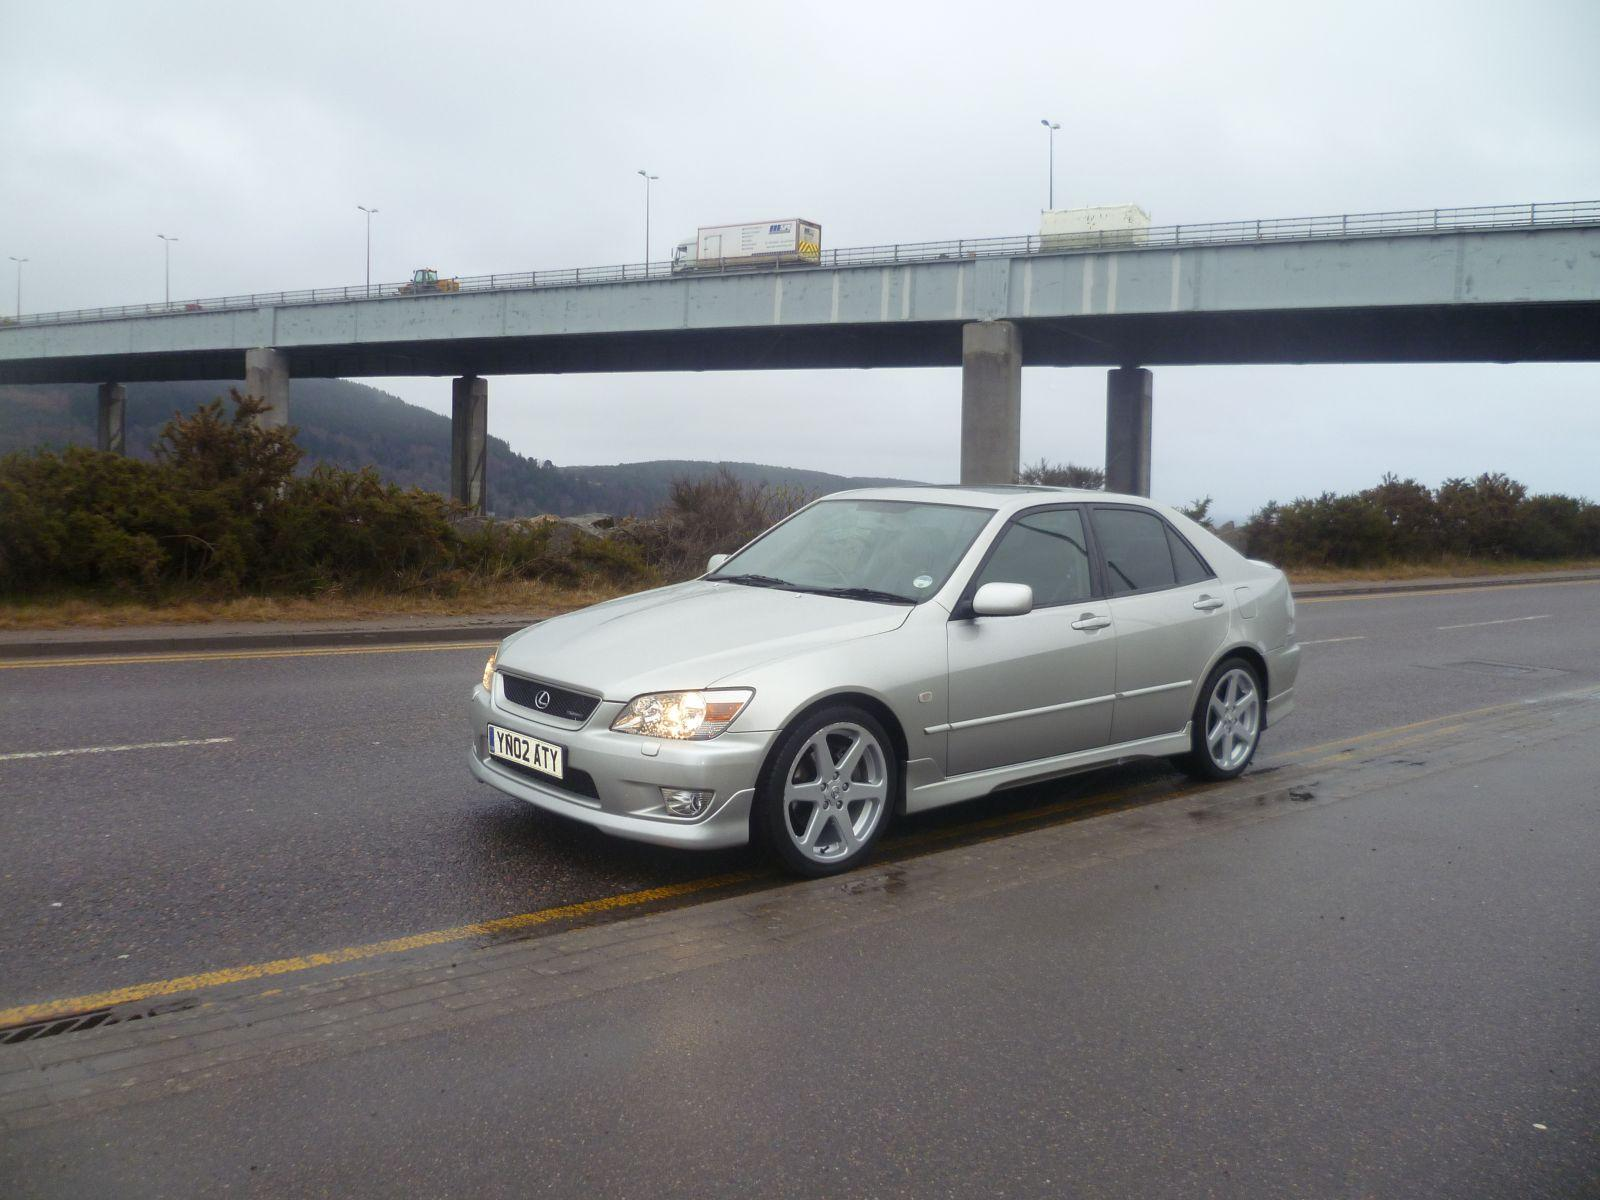 Lexus - Past & Present